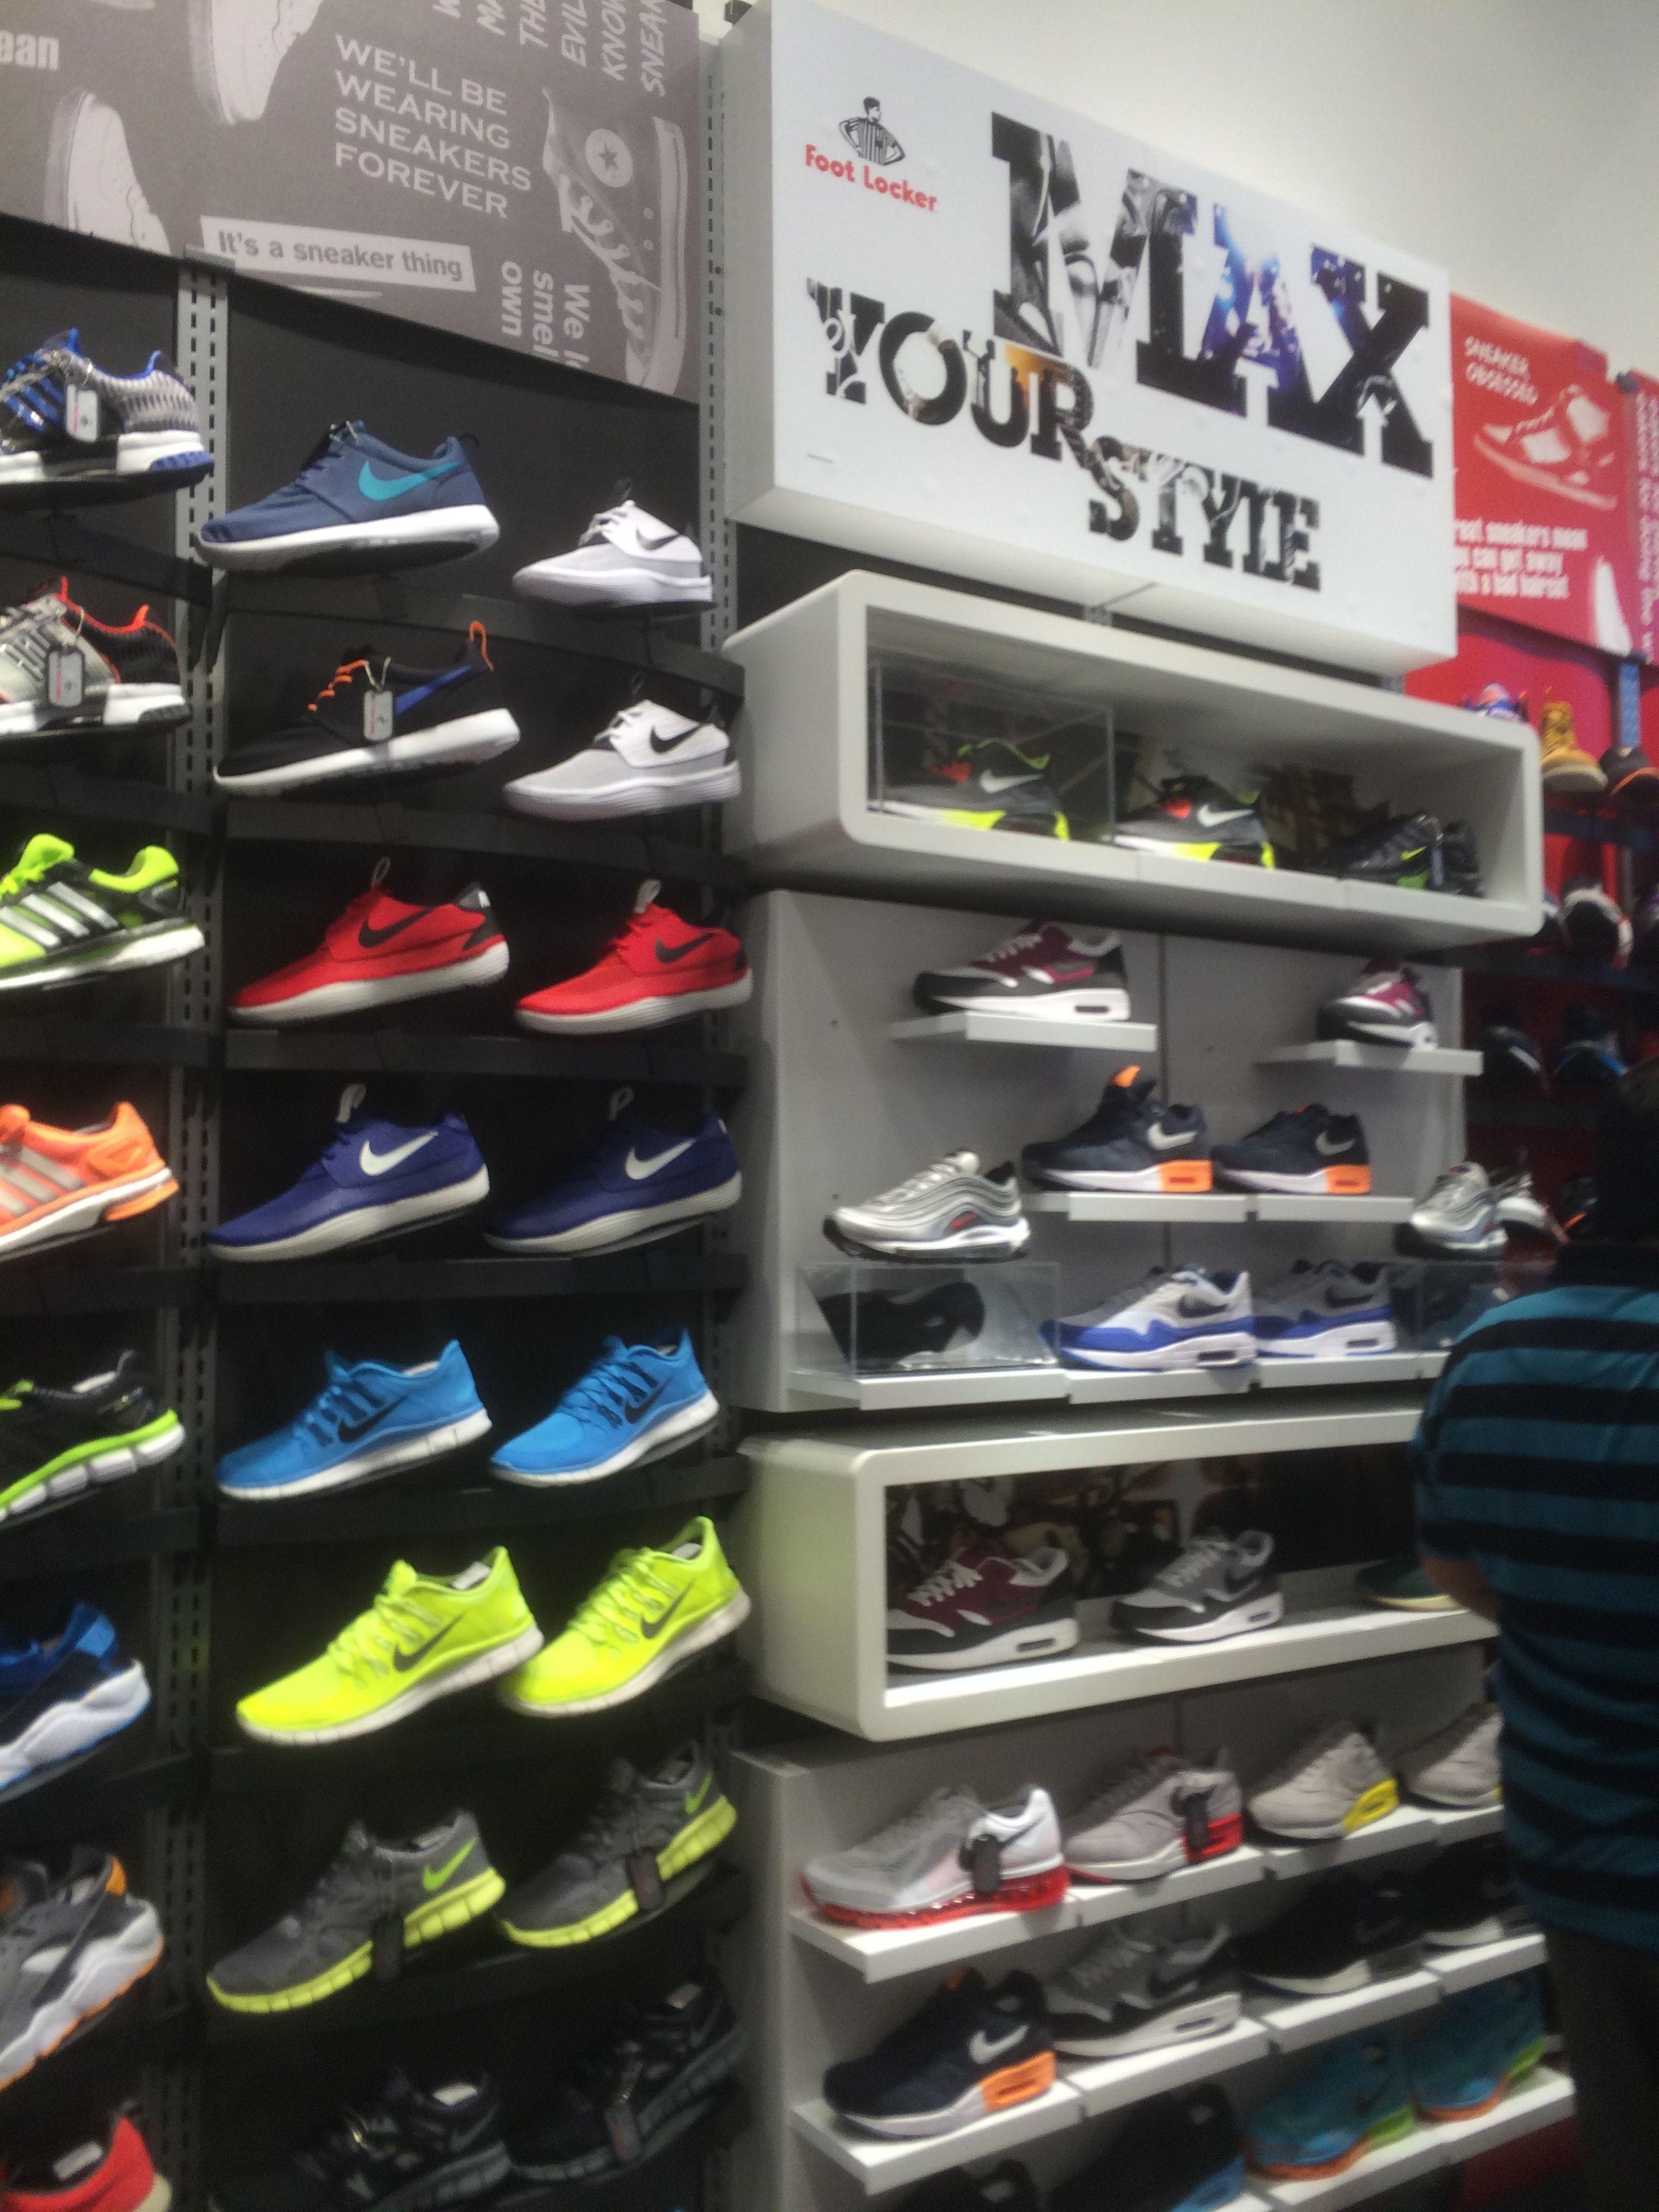 6d1d85ca2b9c95 Foot Locker - UAE - Dubai Mall - Dubai - Footwear - Sport - Layout -  Landscape - Visual Merchandising - www.clearretailgroup.eu